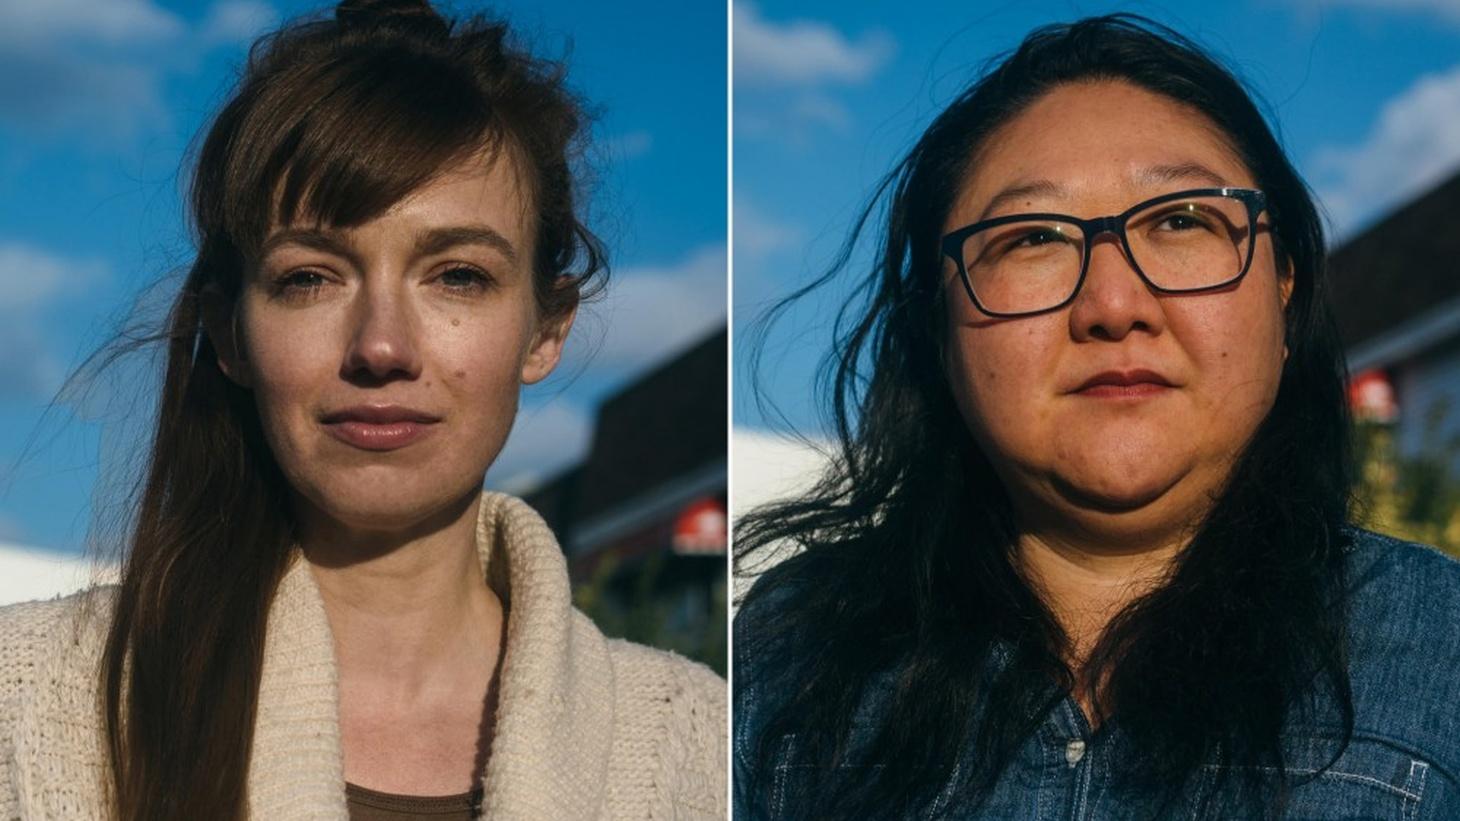 Filmmakers, Emelie Mahdavian and Su Kim